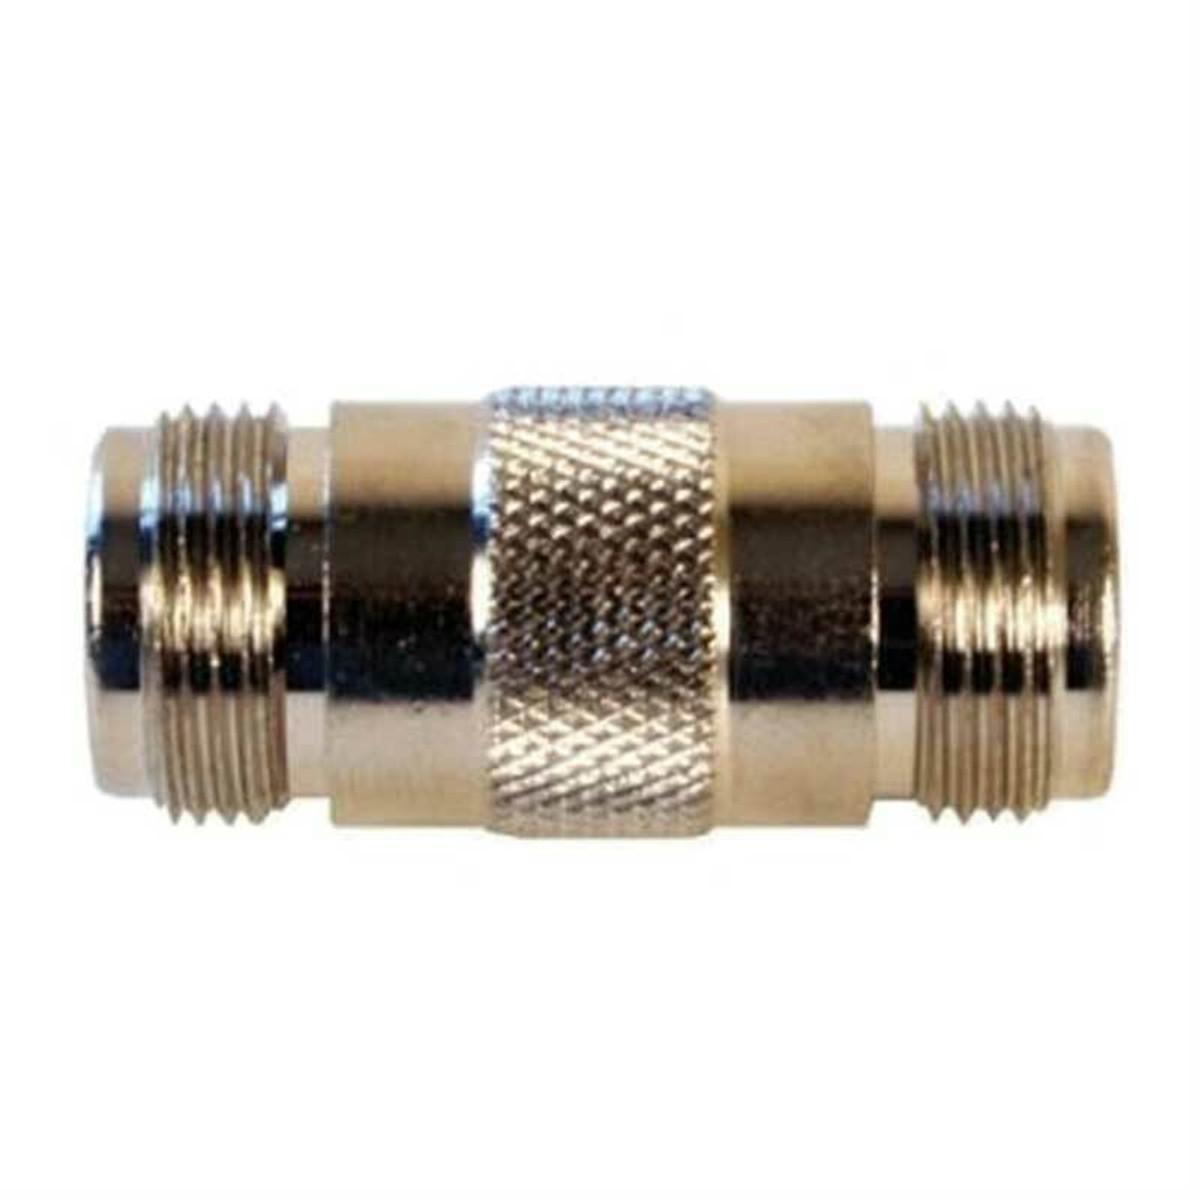 Wilson Electronics weBoost Wilson 971117 N-Female to N-Female Barrel Connector